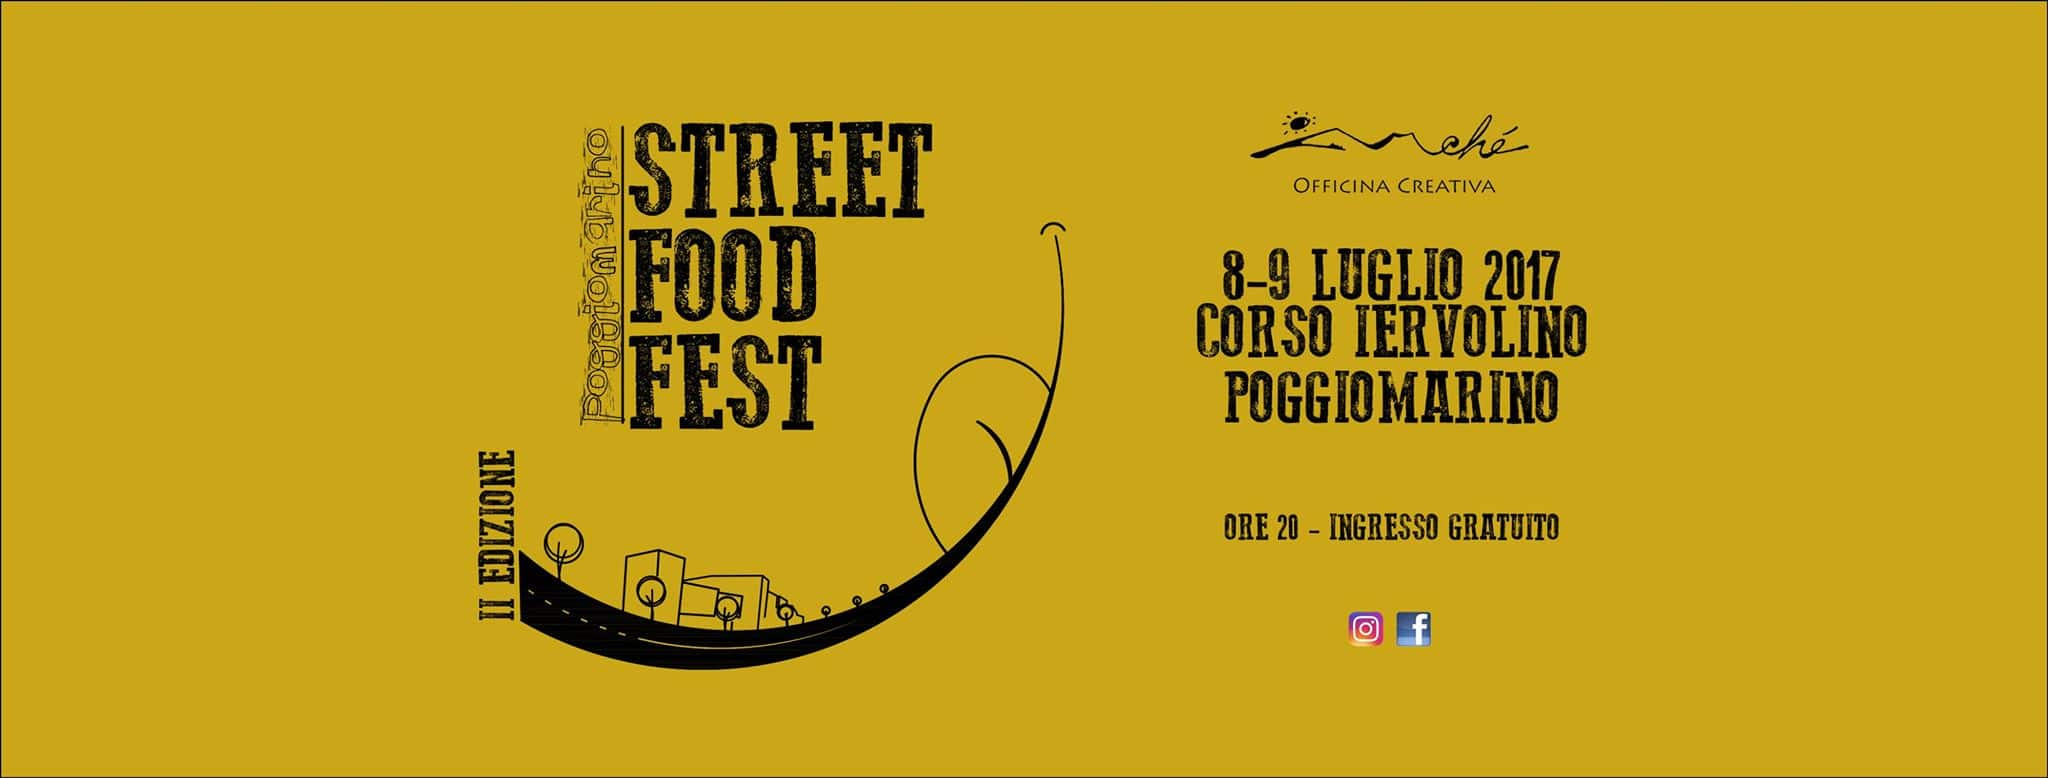 Street food fest Poggiomarino